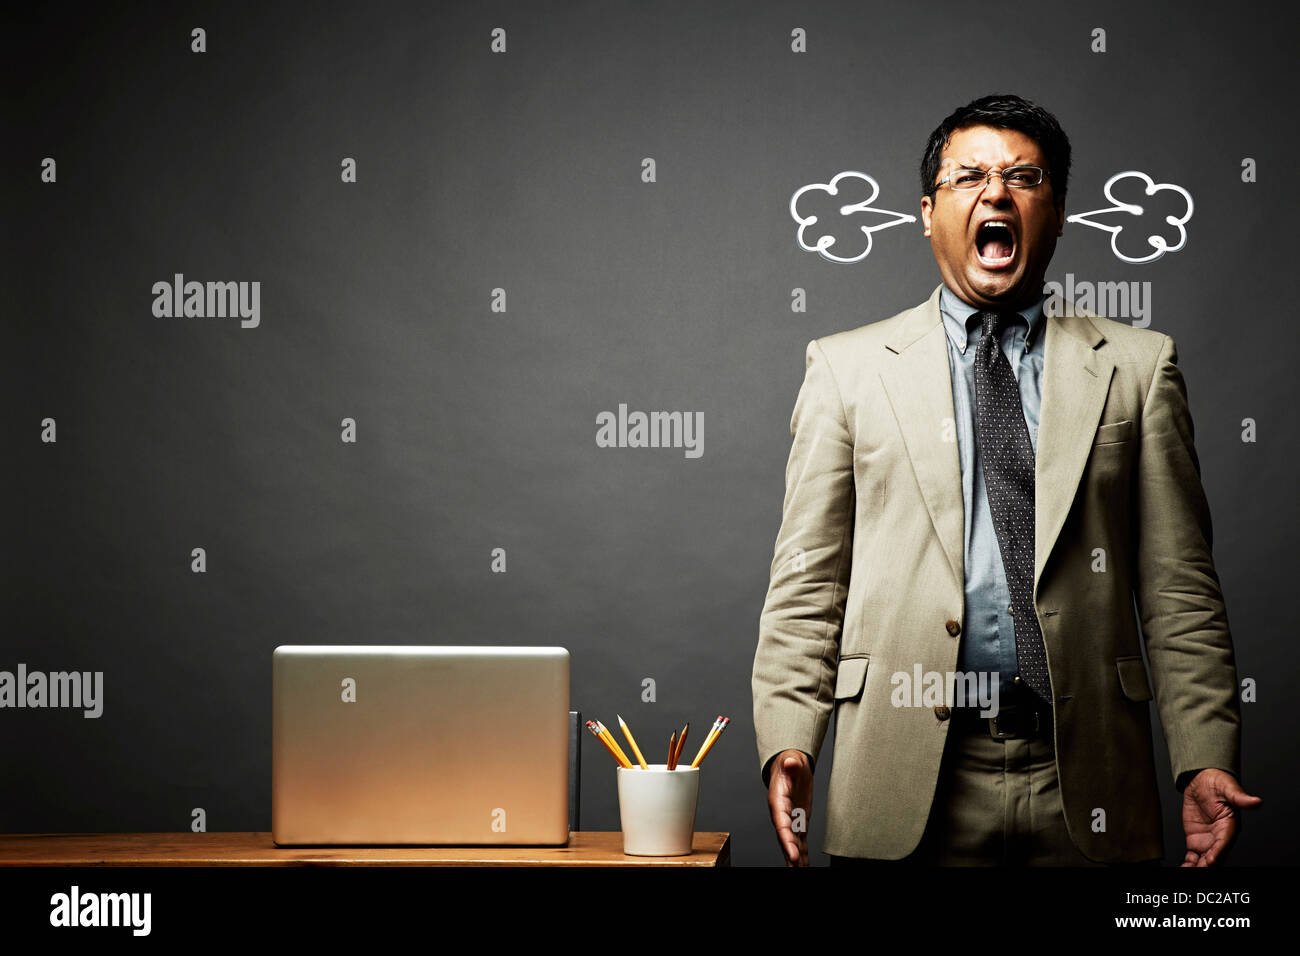 Man shouting and fuming - Stock Image